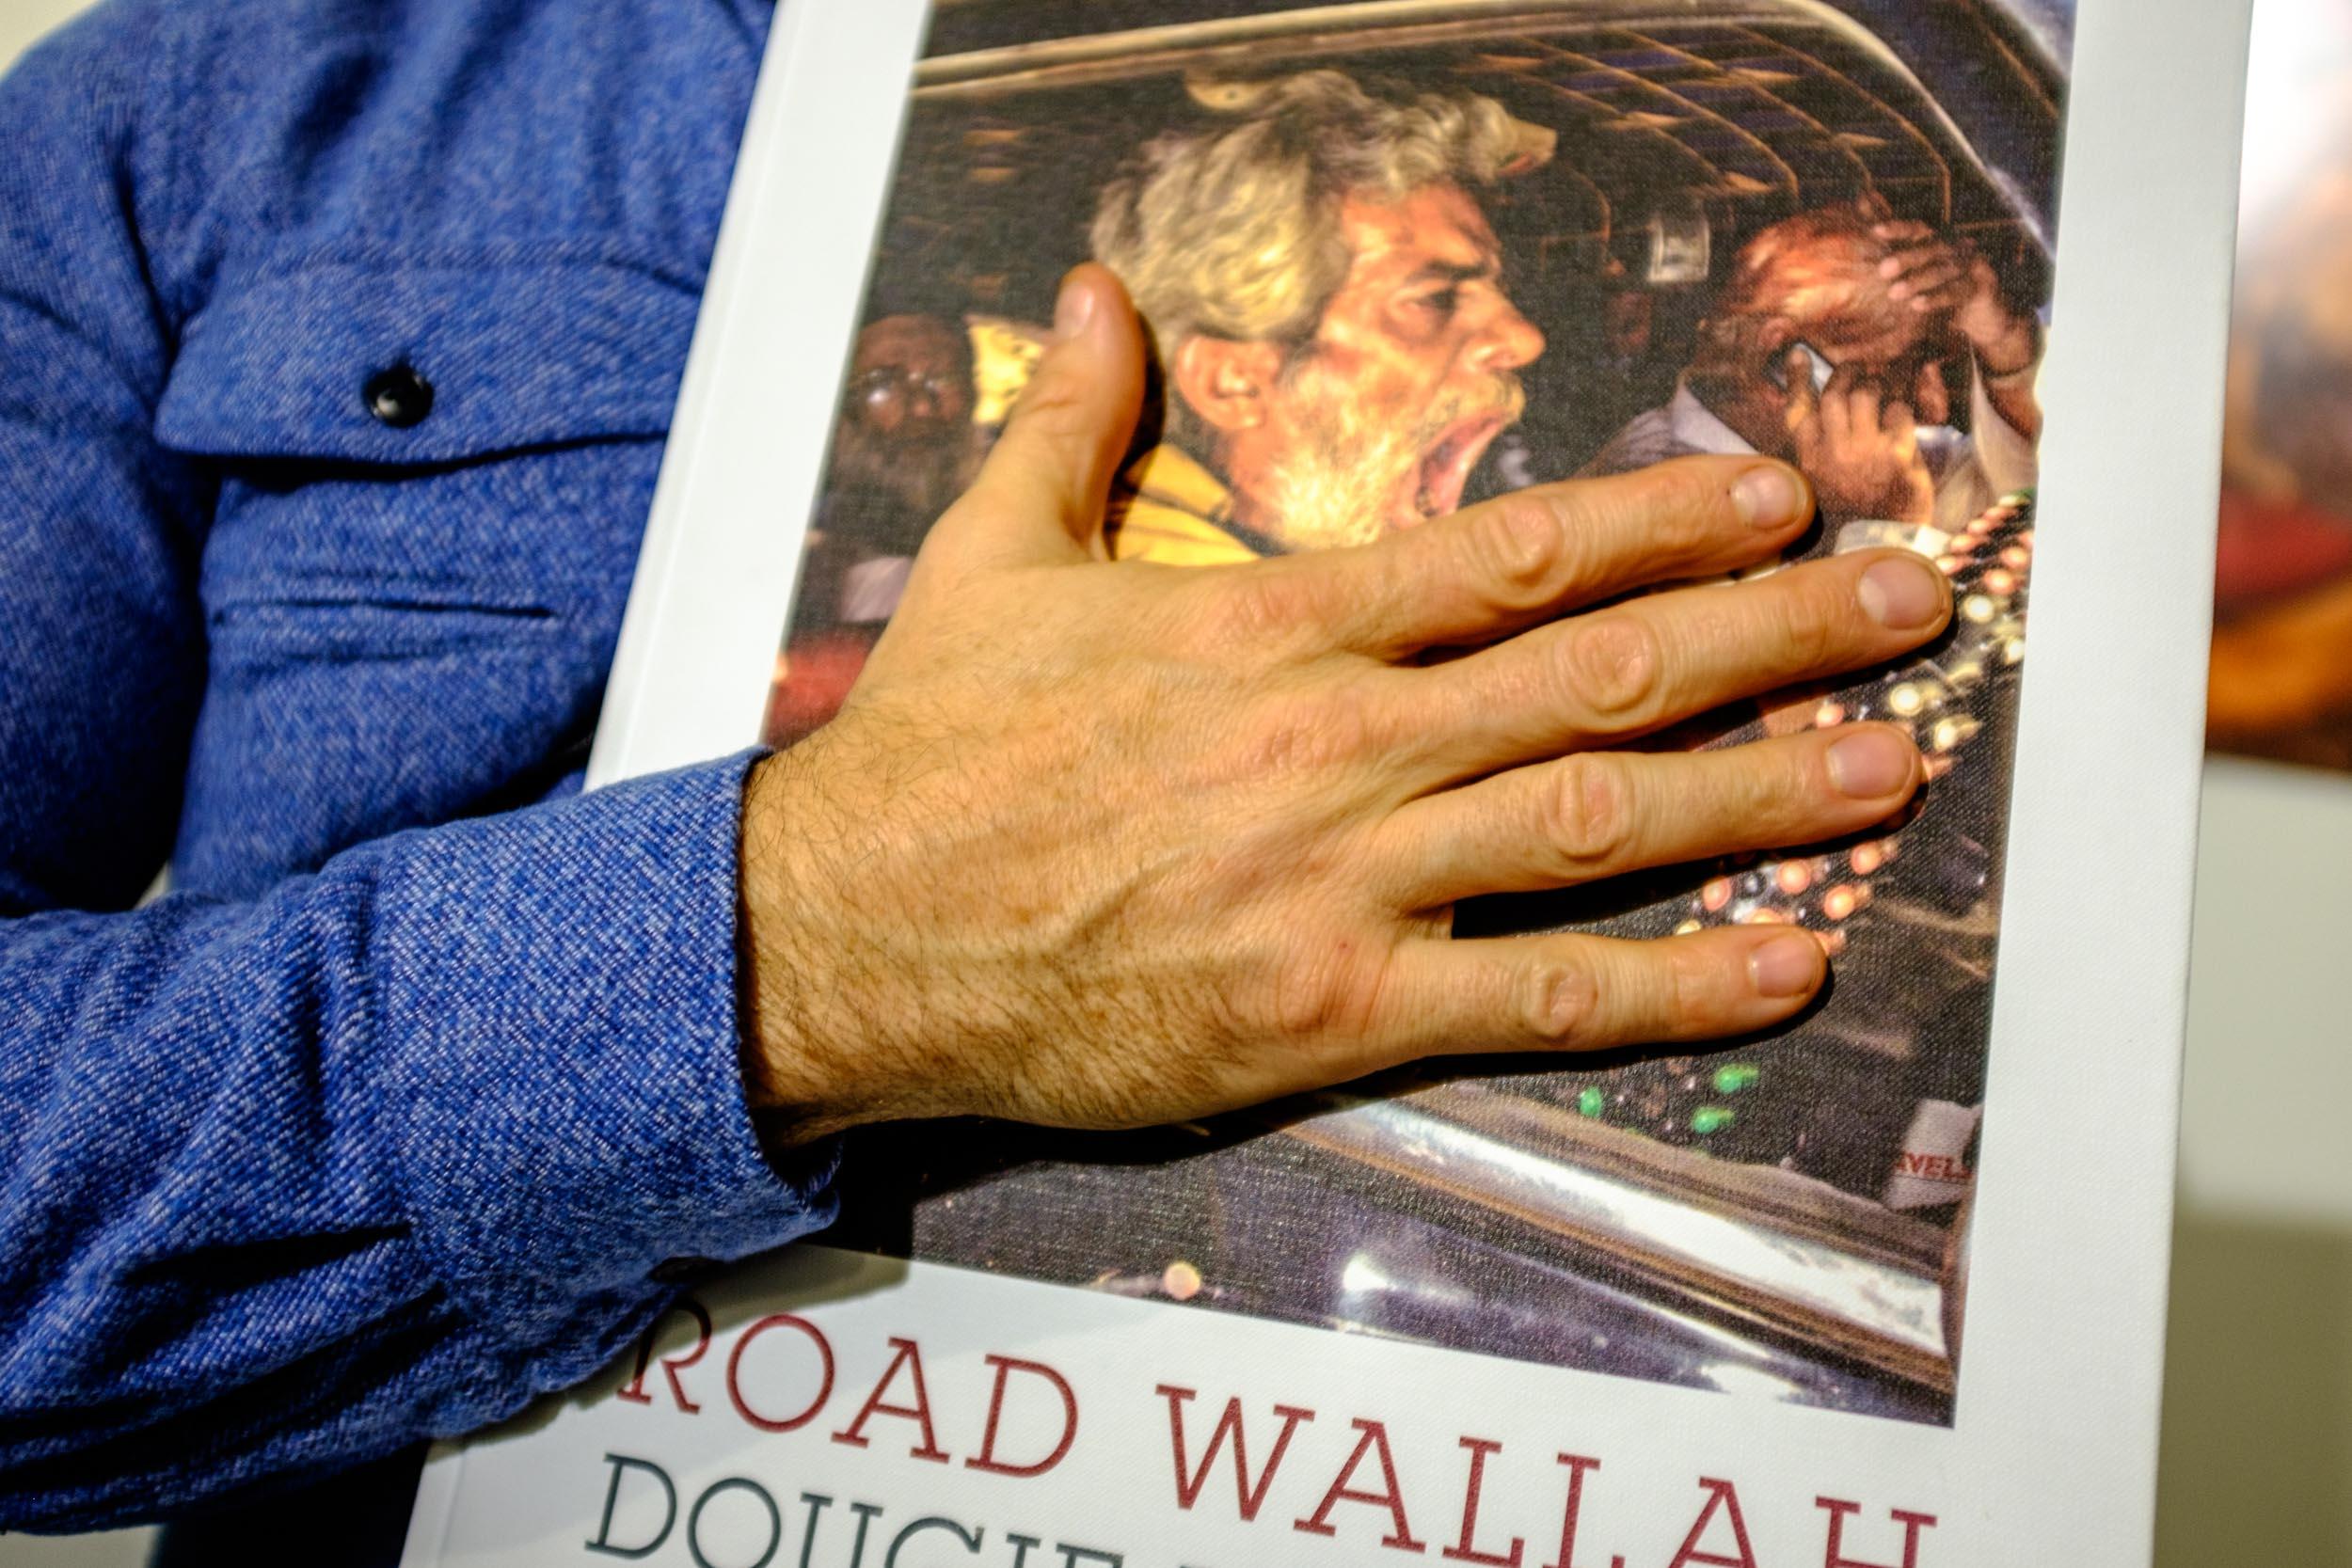 033 - Dougie Wallace -  - (c) Michael Goldrei.jpg